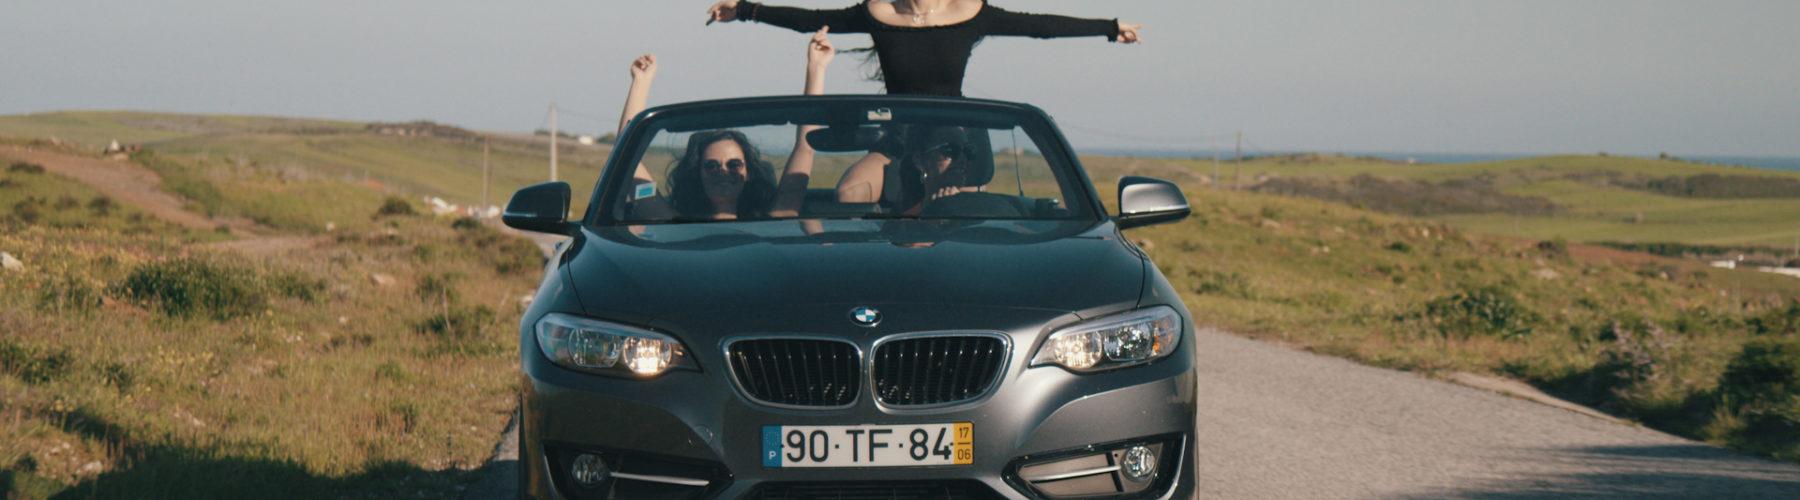 ALGARVE – BTS VOM ALLES IST OKAY MUSIKVIDEO DREH ! VLOG #12